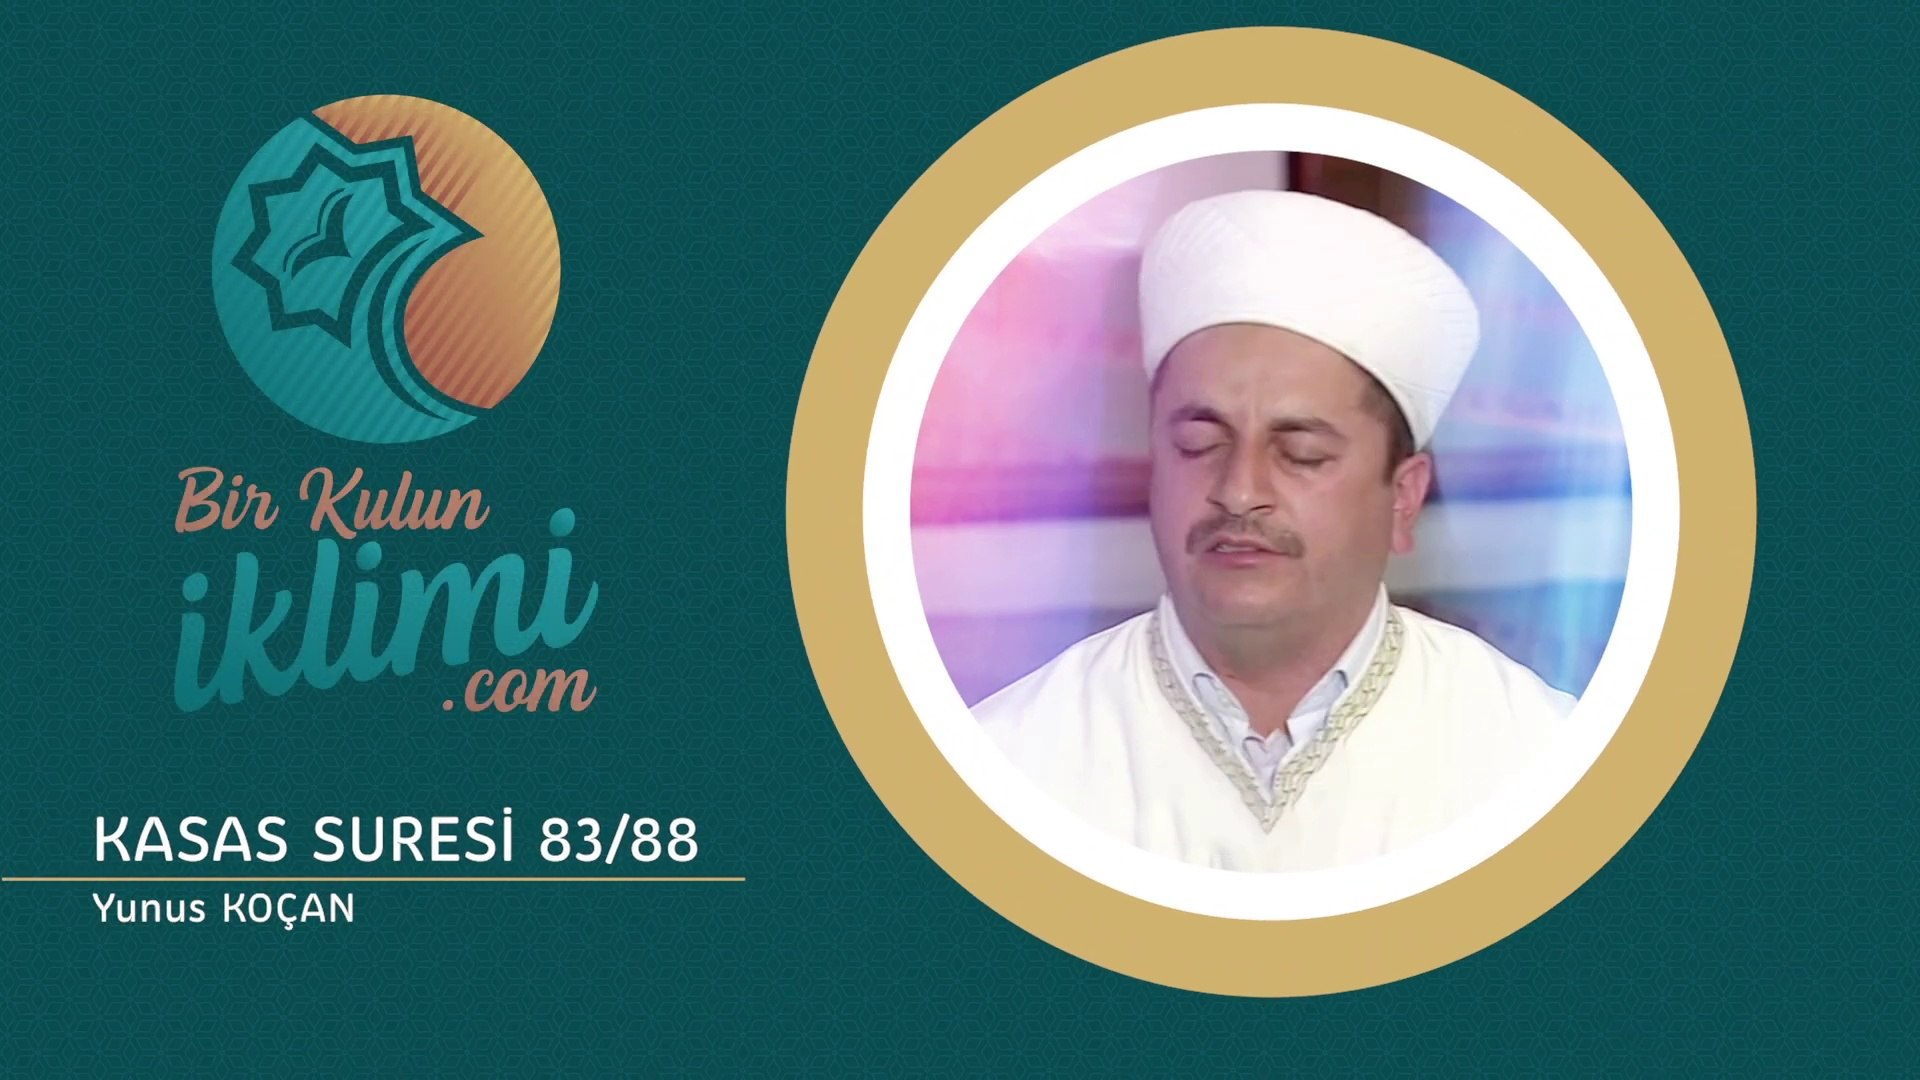 Kasas Suresi 83_88 Yunus KOÇAN - Best Quran Recitation - Quran Tilawat - Harika Tilavet